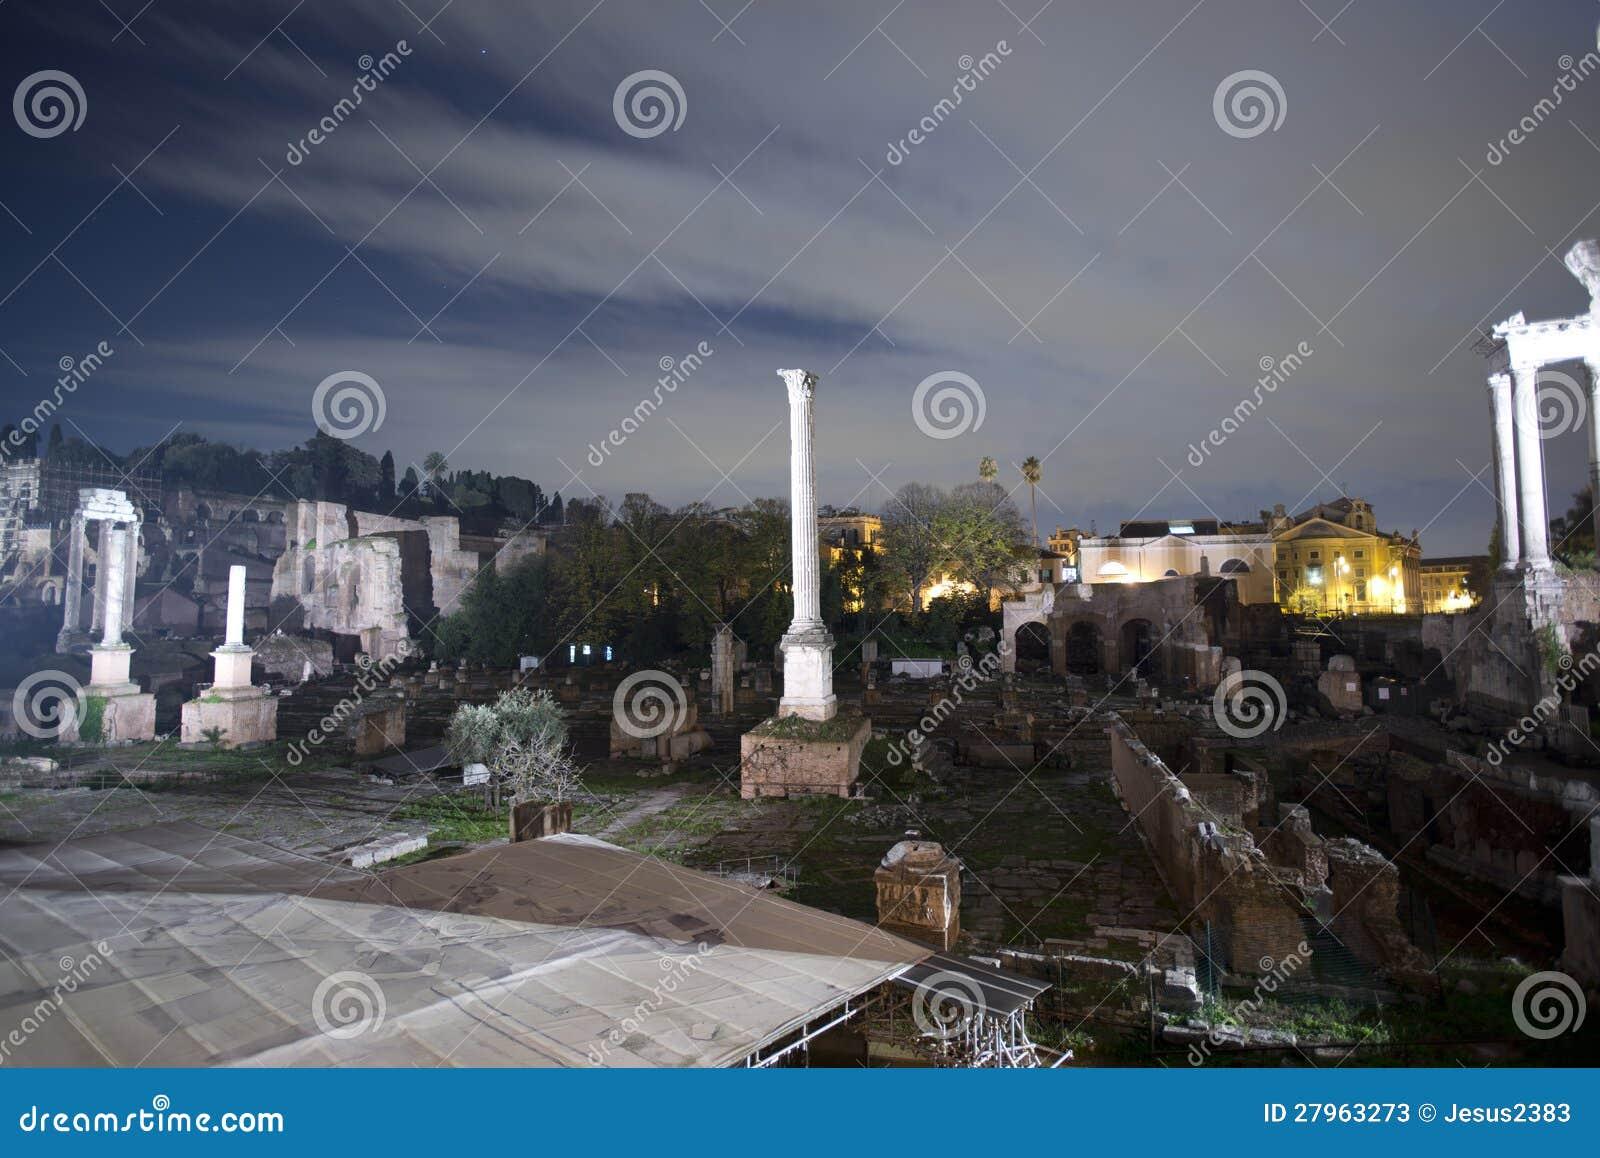 Sceau de fléau, forum romain